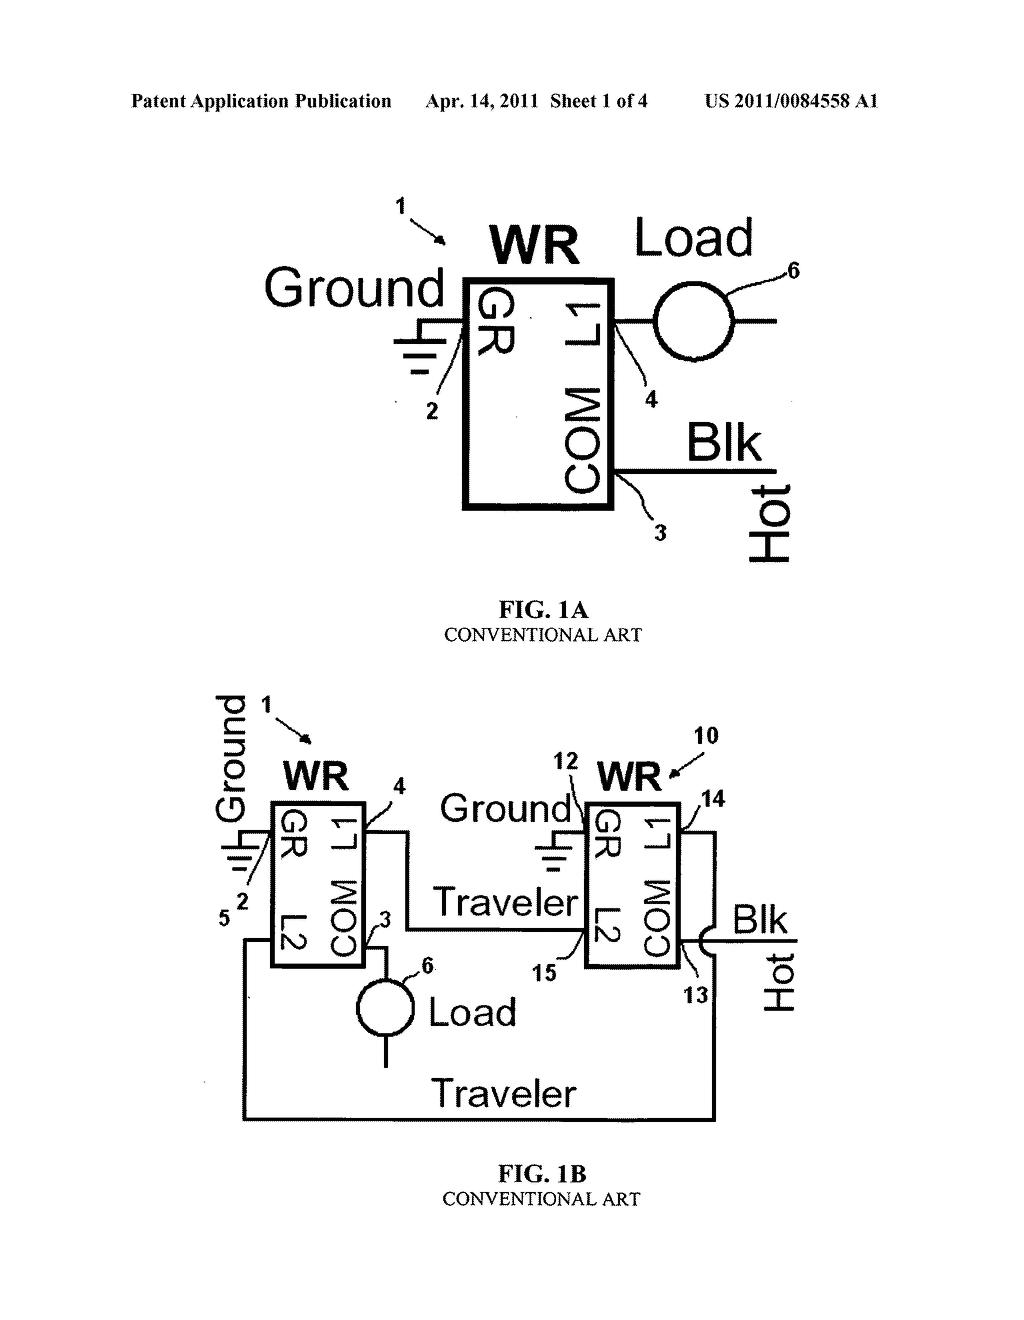 3 Way Motion Sensor Switch Wiring Diagram : motion, sensor, switch, wiring, diagram, Motion, Sensor, Switch, 3-way, Light, Circuit, Method, Lighting, Control, Using, Diagram,, Schematic,, Image